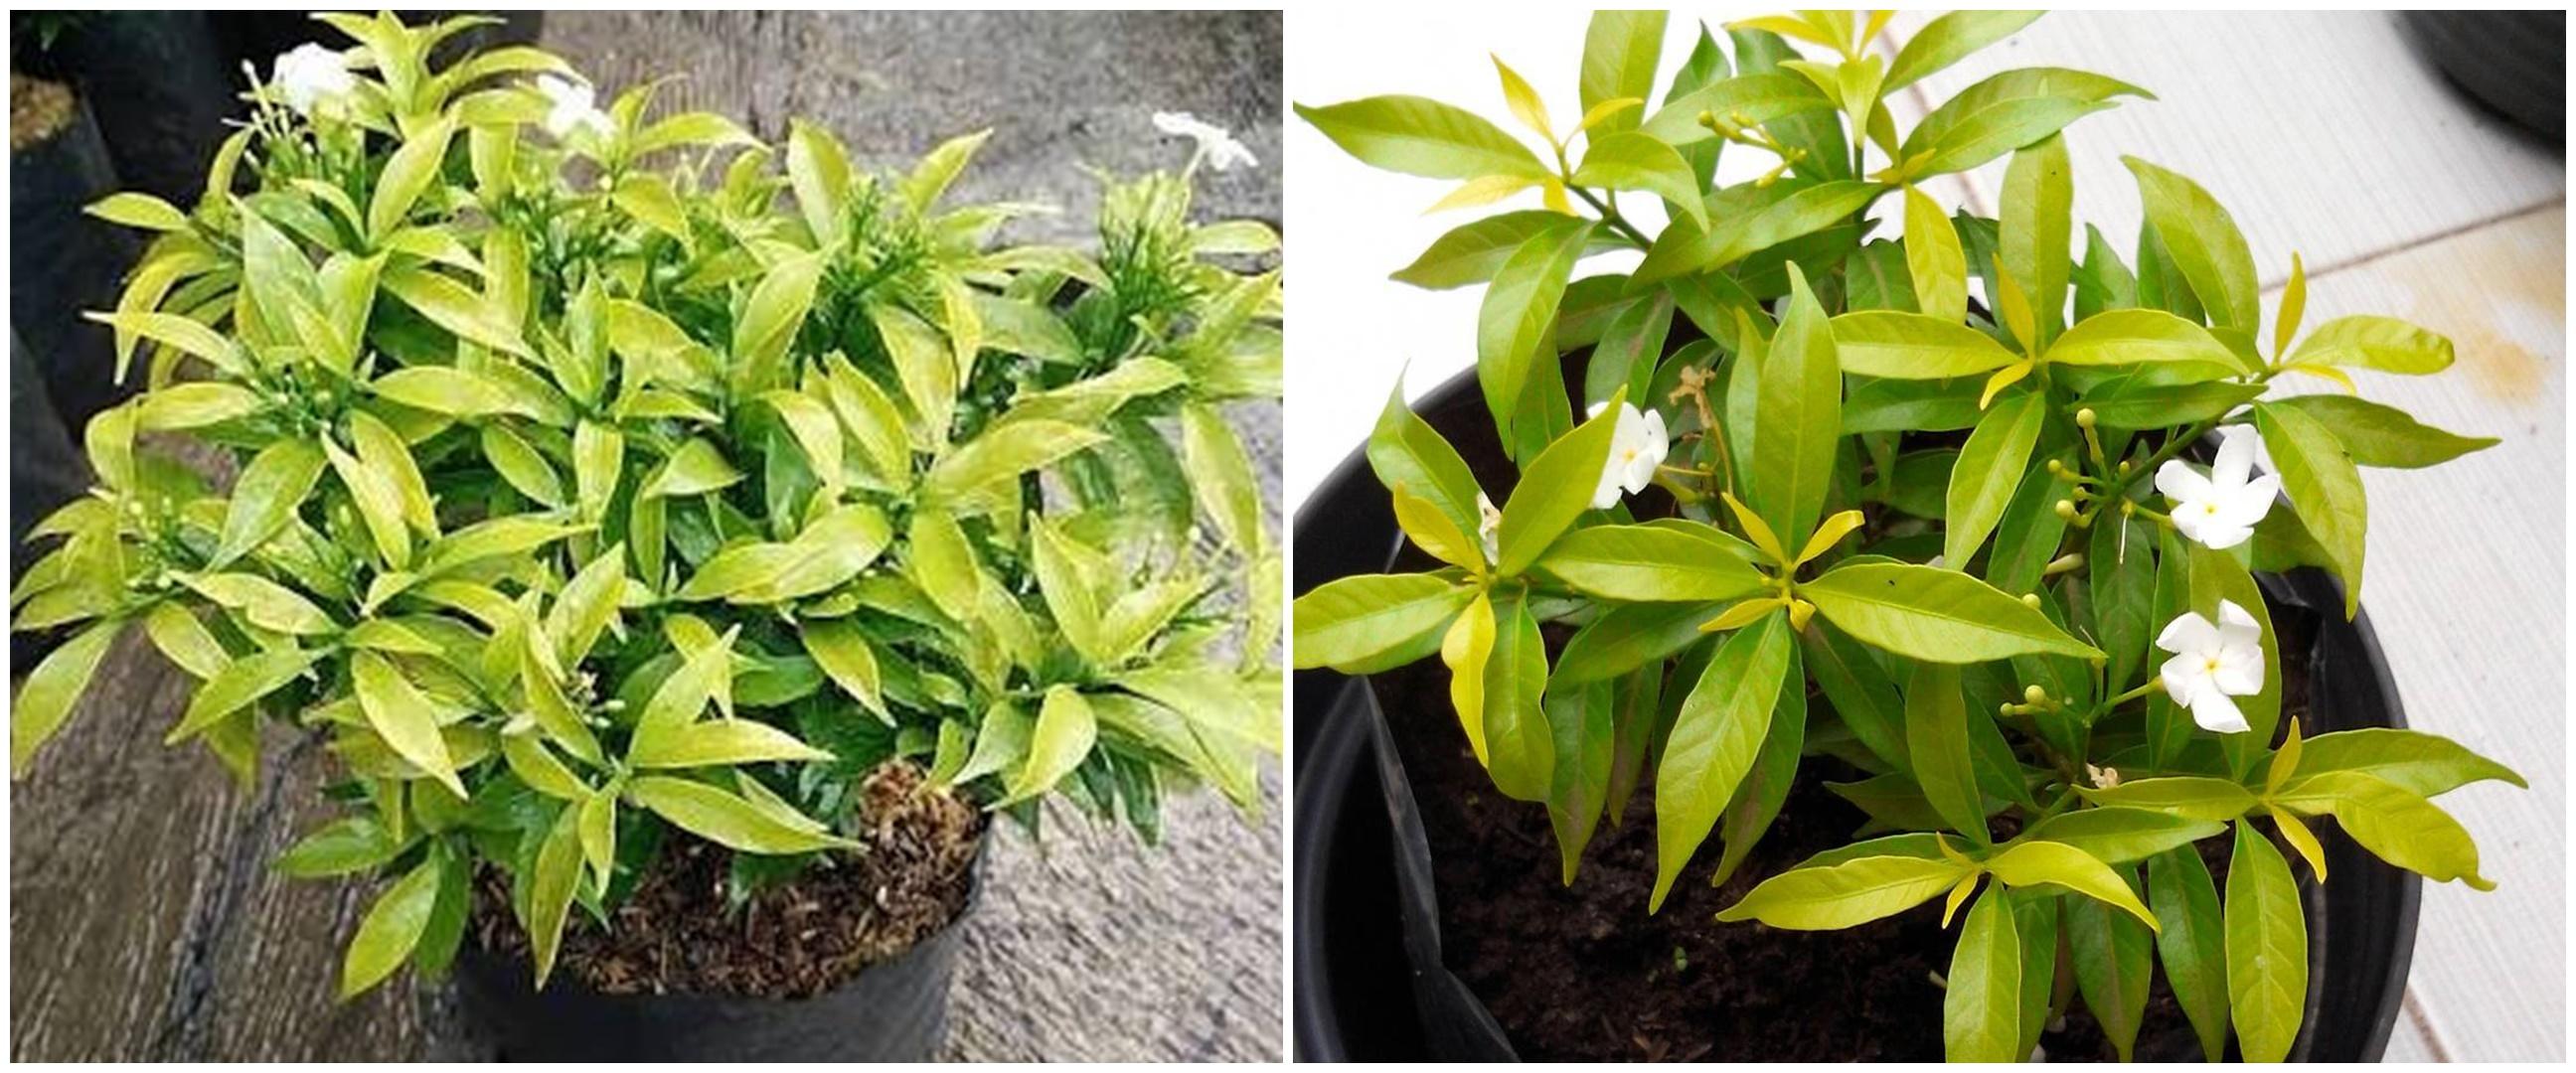 8 Cara merawat tanaman hias gantung bunga sabrina, mudah dan efektif